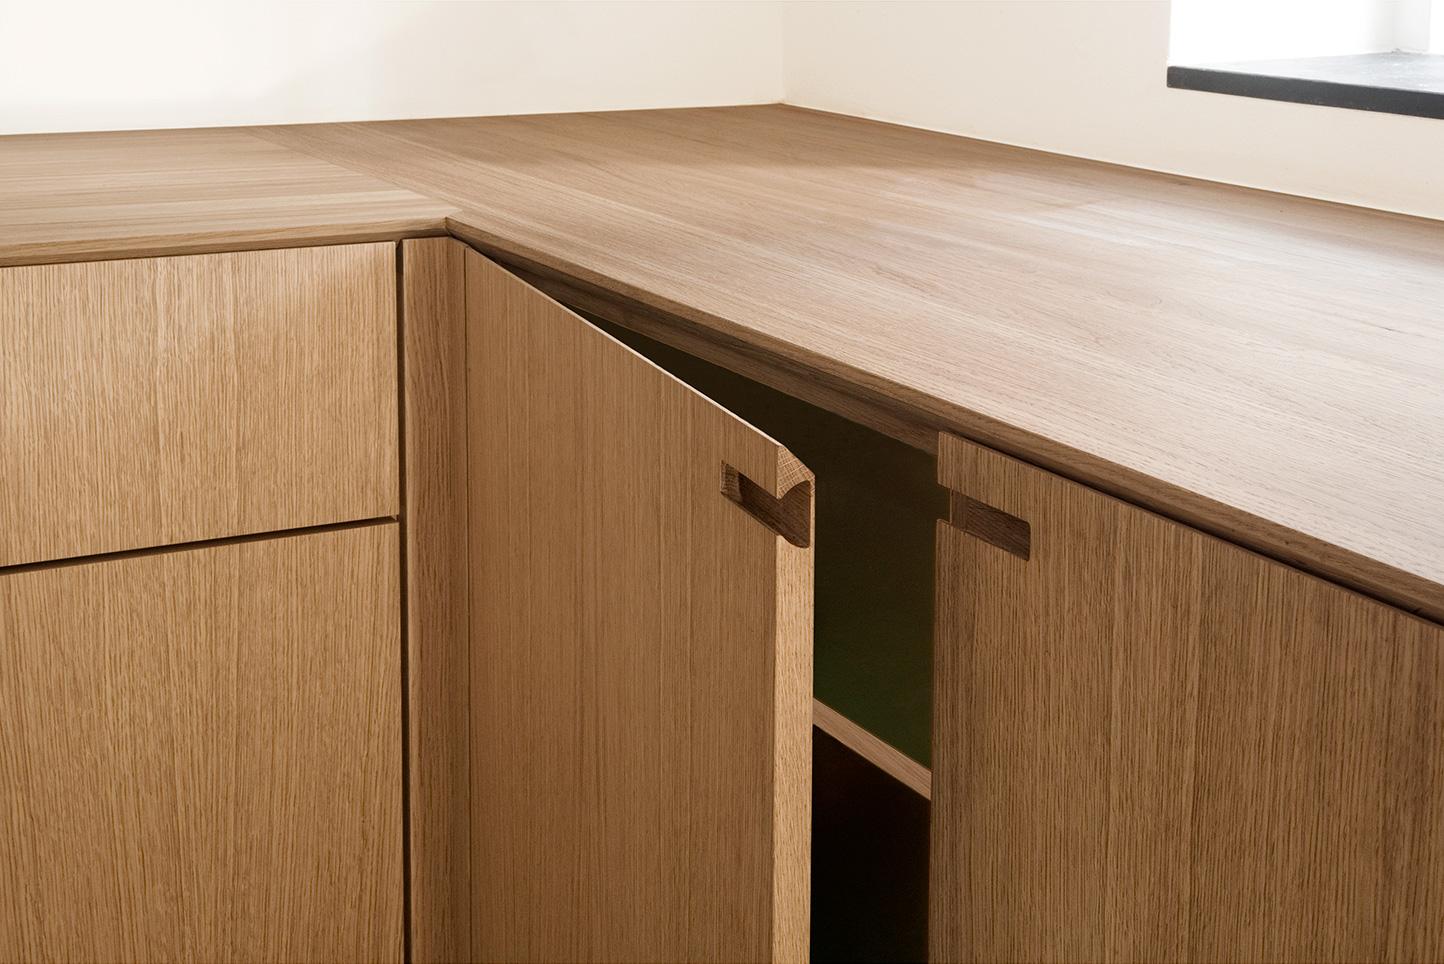 Danish minimalist kitchen design - by Nicolaj Bo™